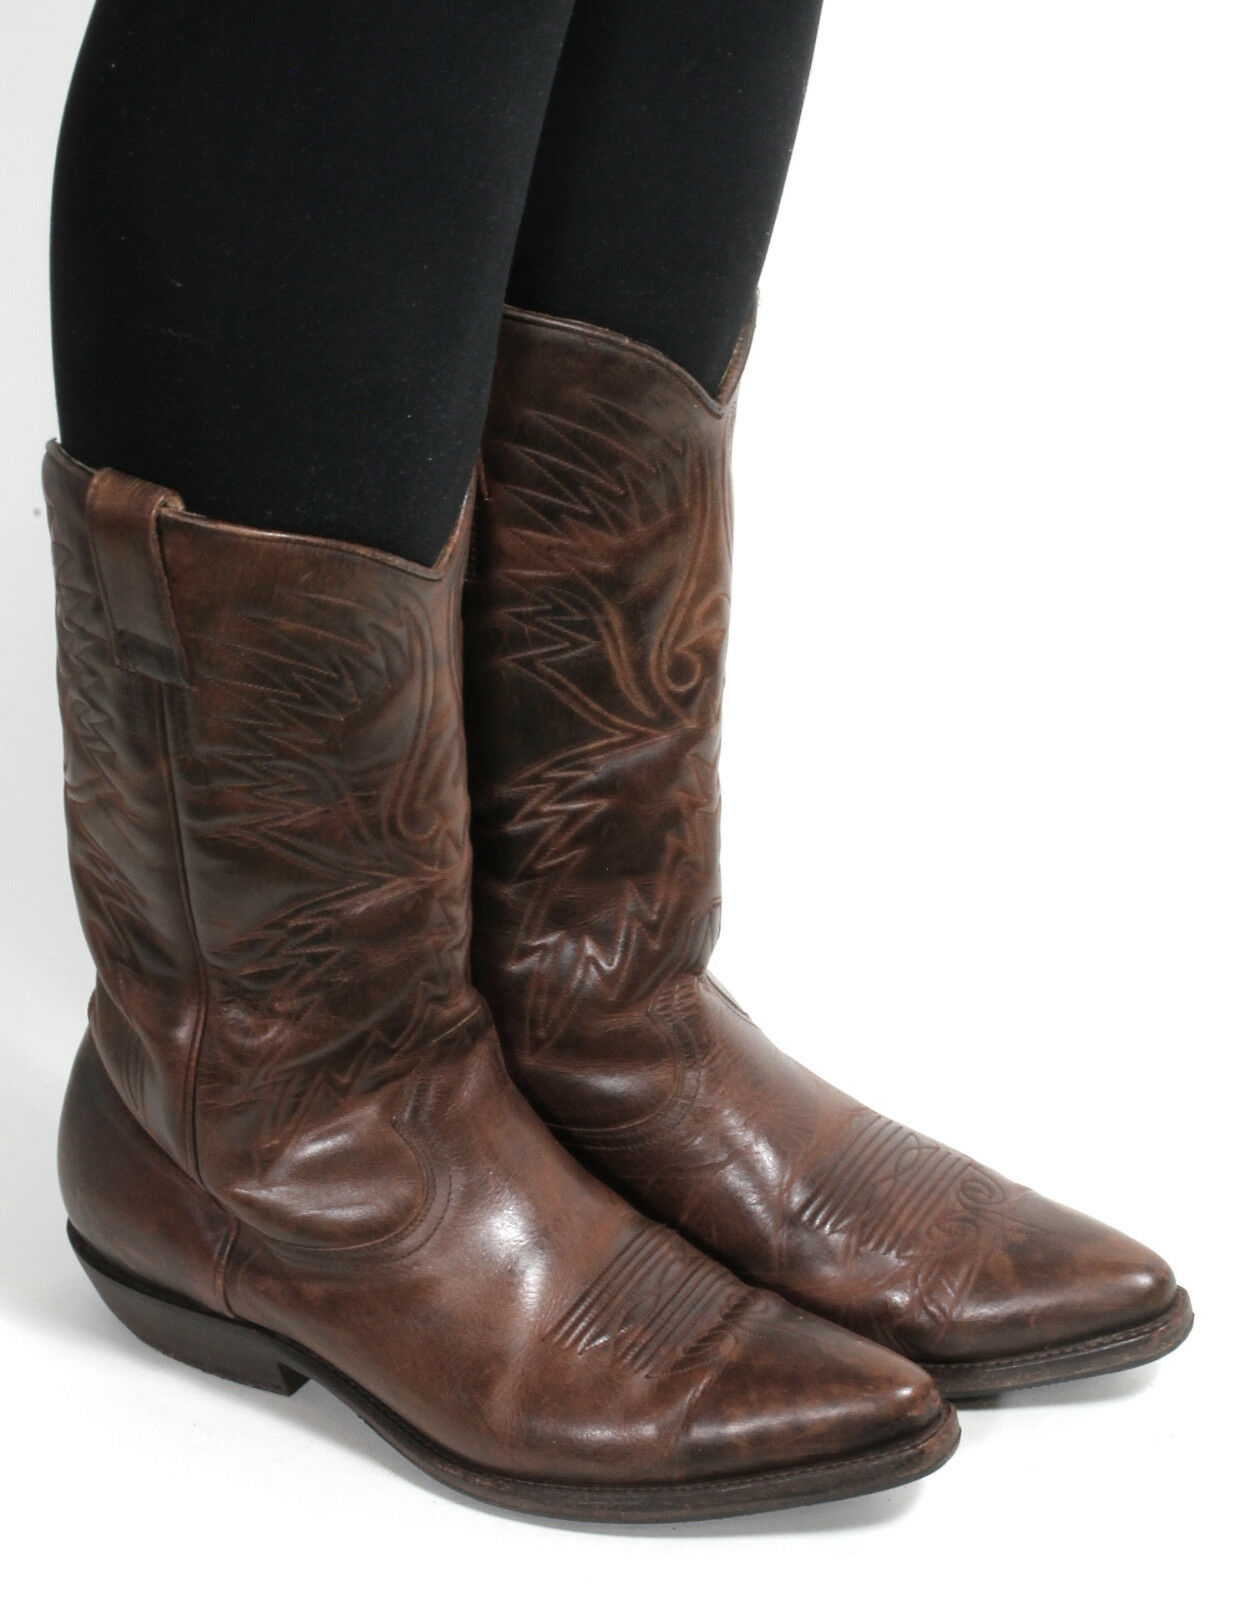 Westernstiefel Cowboystiefel Catalan Style Line Dance Texas Stiefel Don Quijote 38